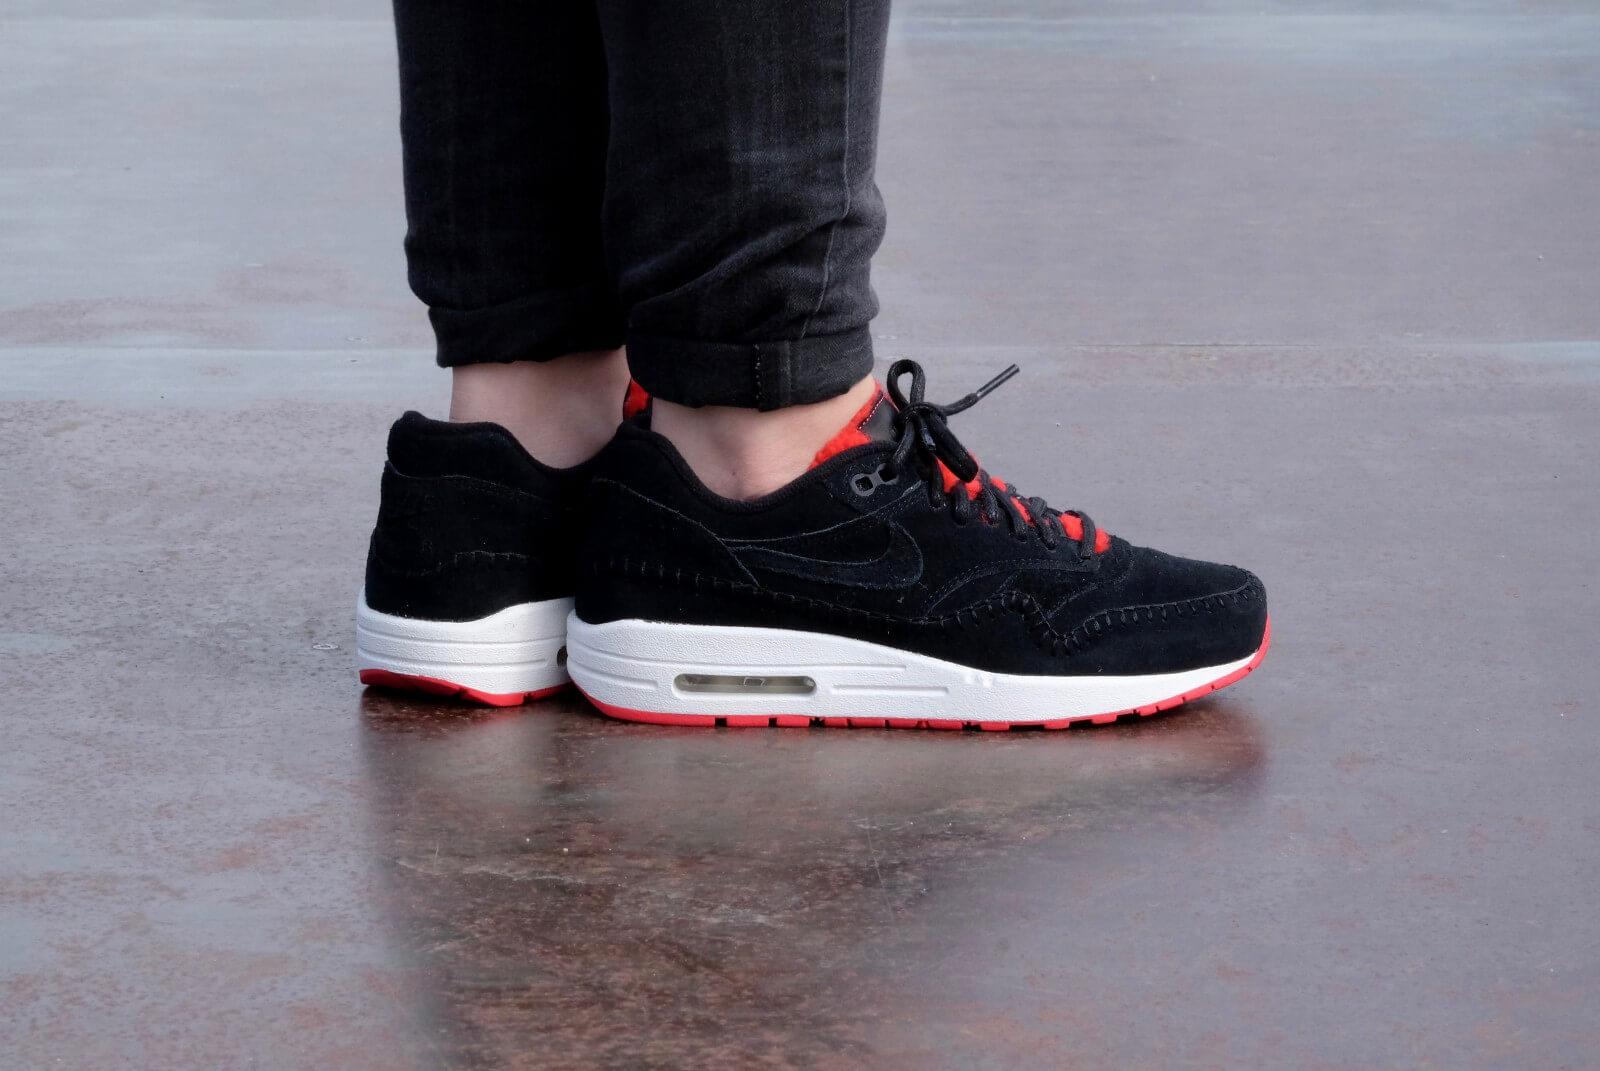 Nike WMNS Air Max 1 PRM Black Black Action Red 454746 010